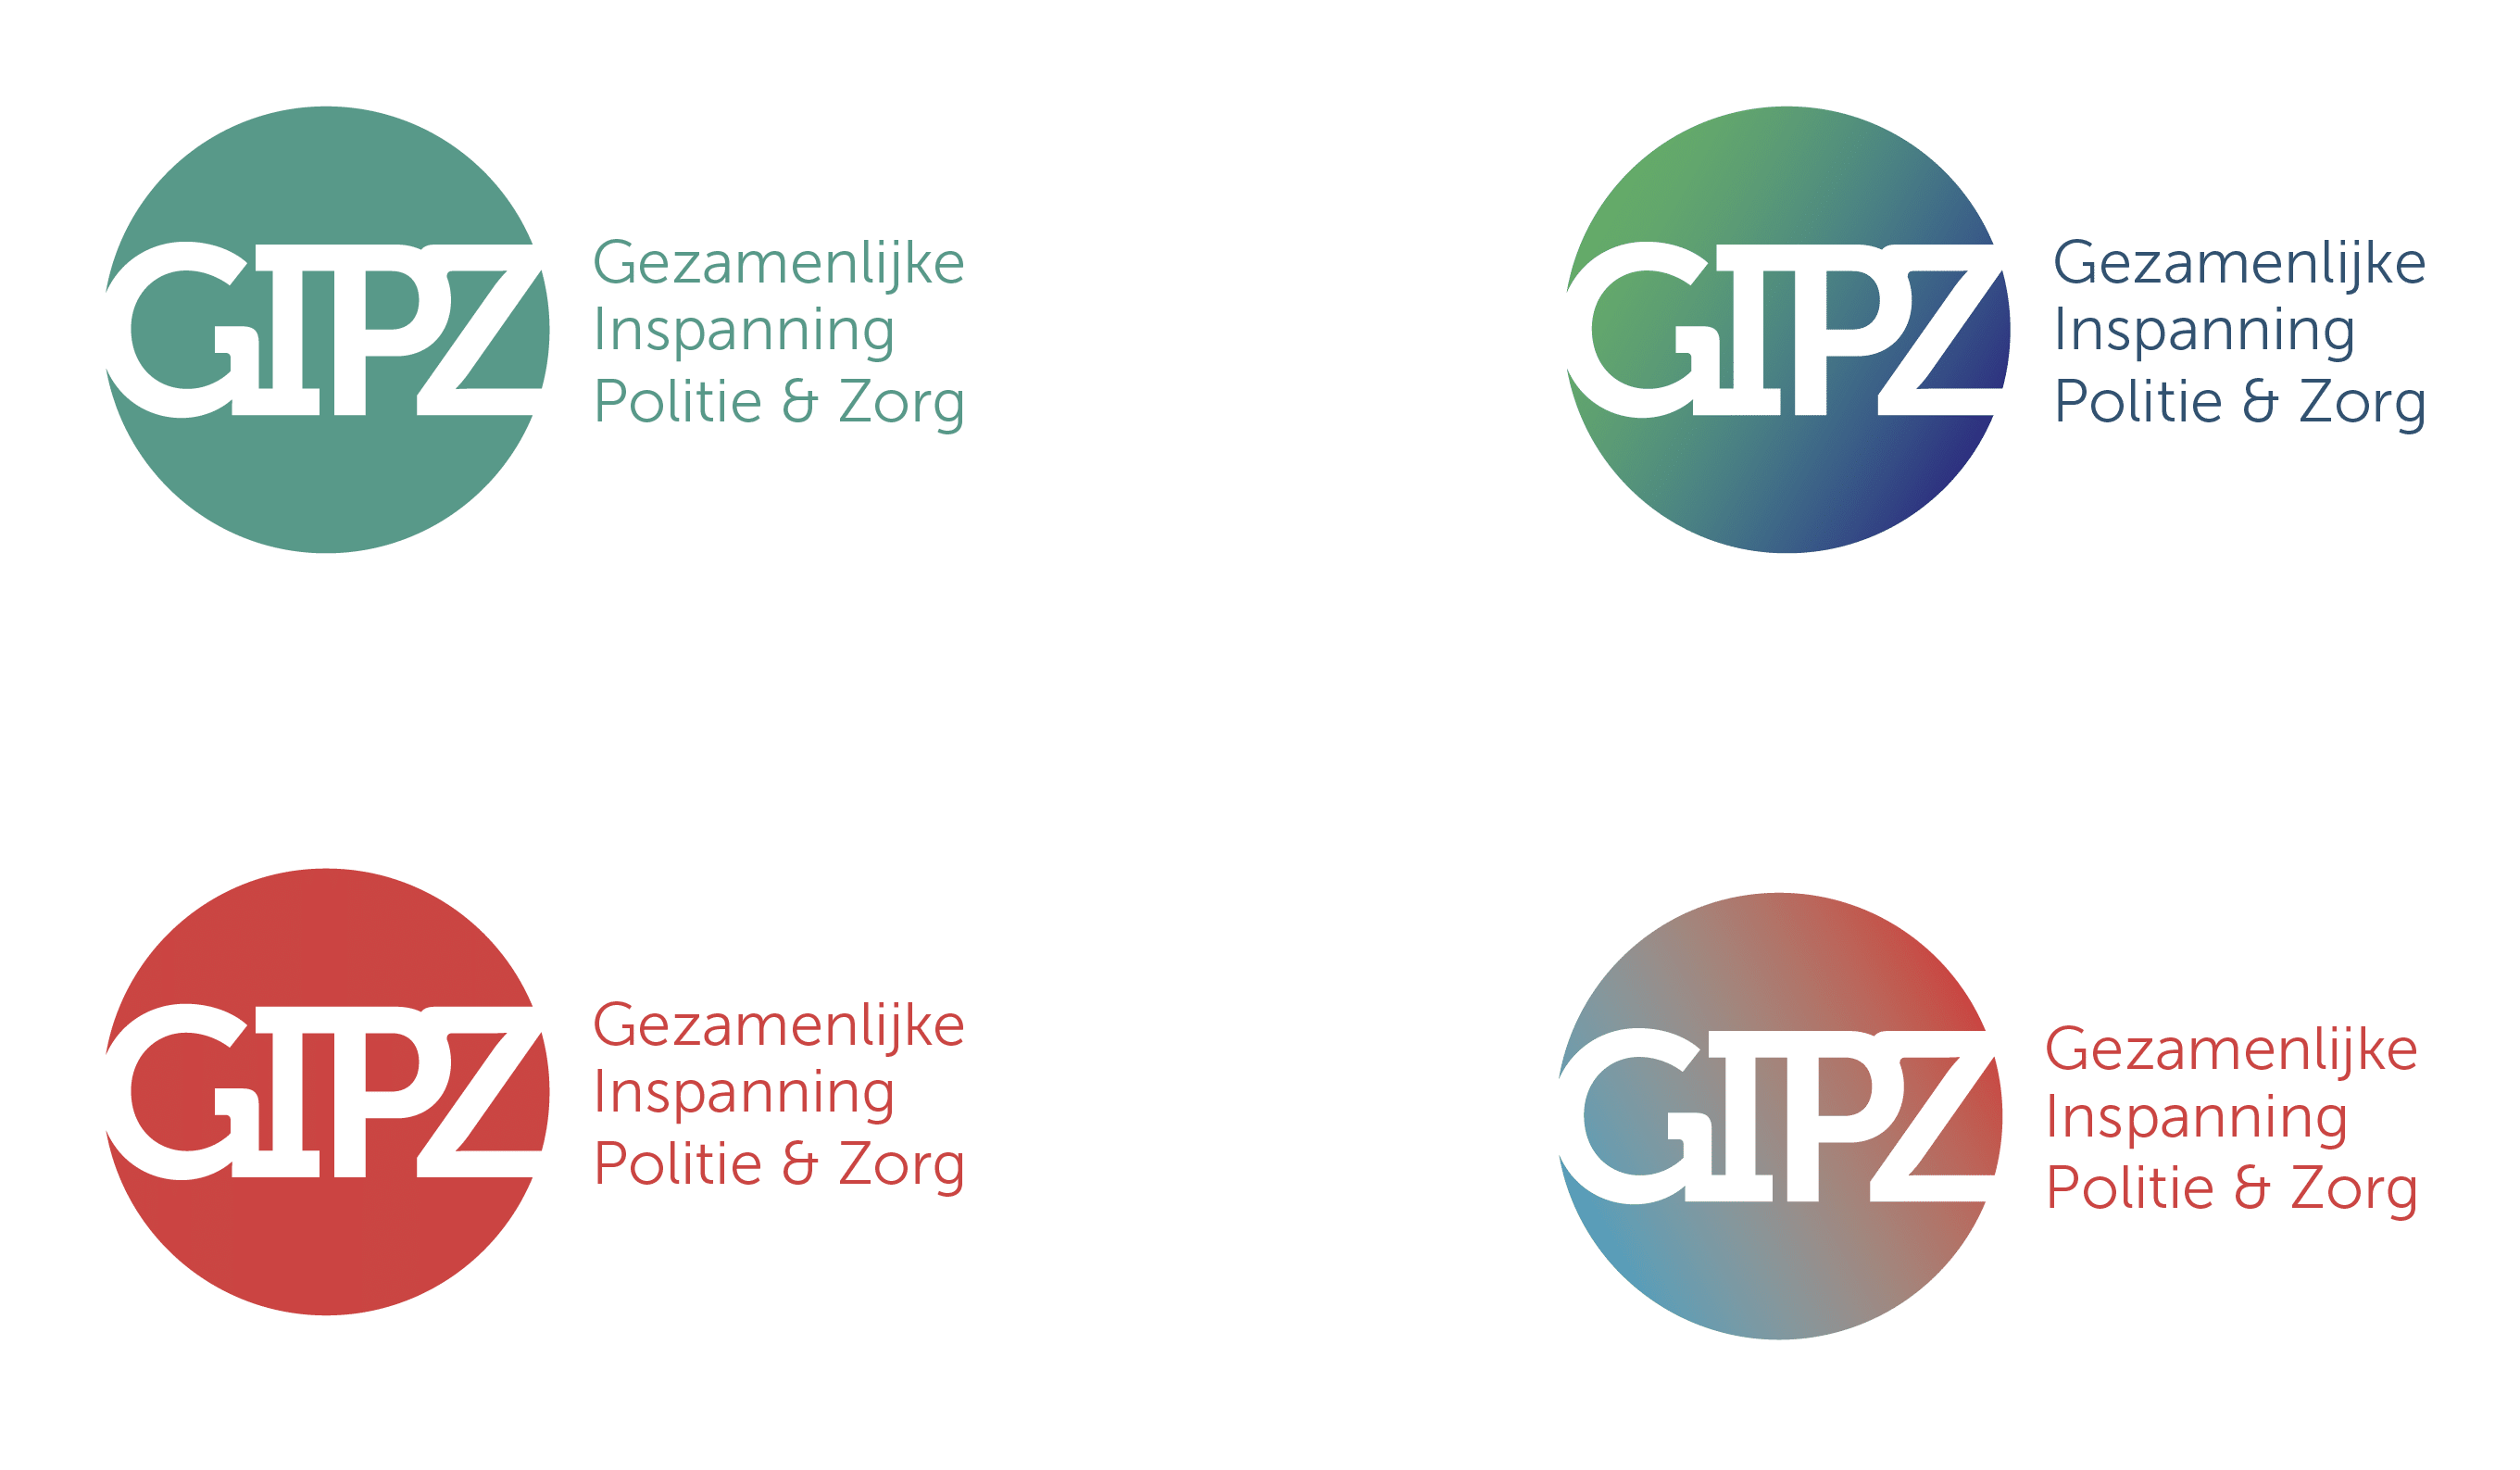 Kleurenpallet logo GIPZ - studio S&H Grafisch Ontwerp